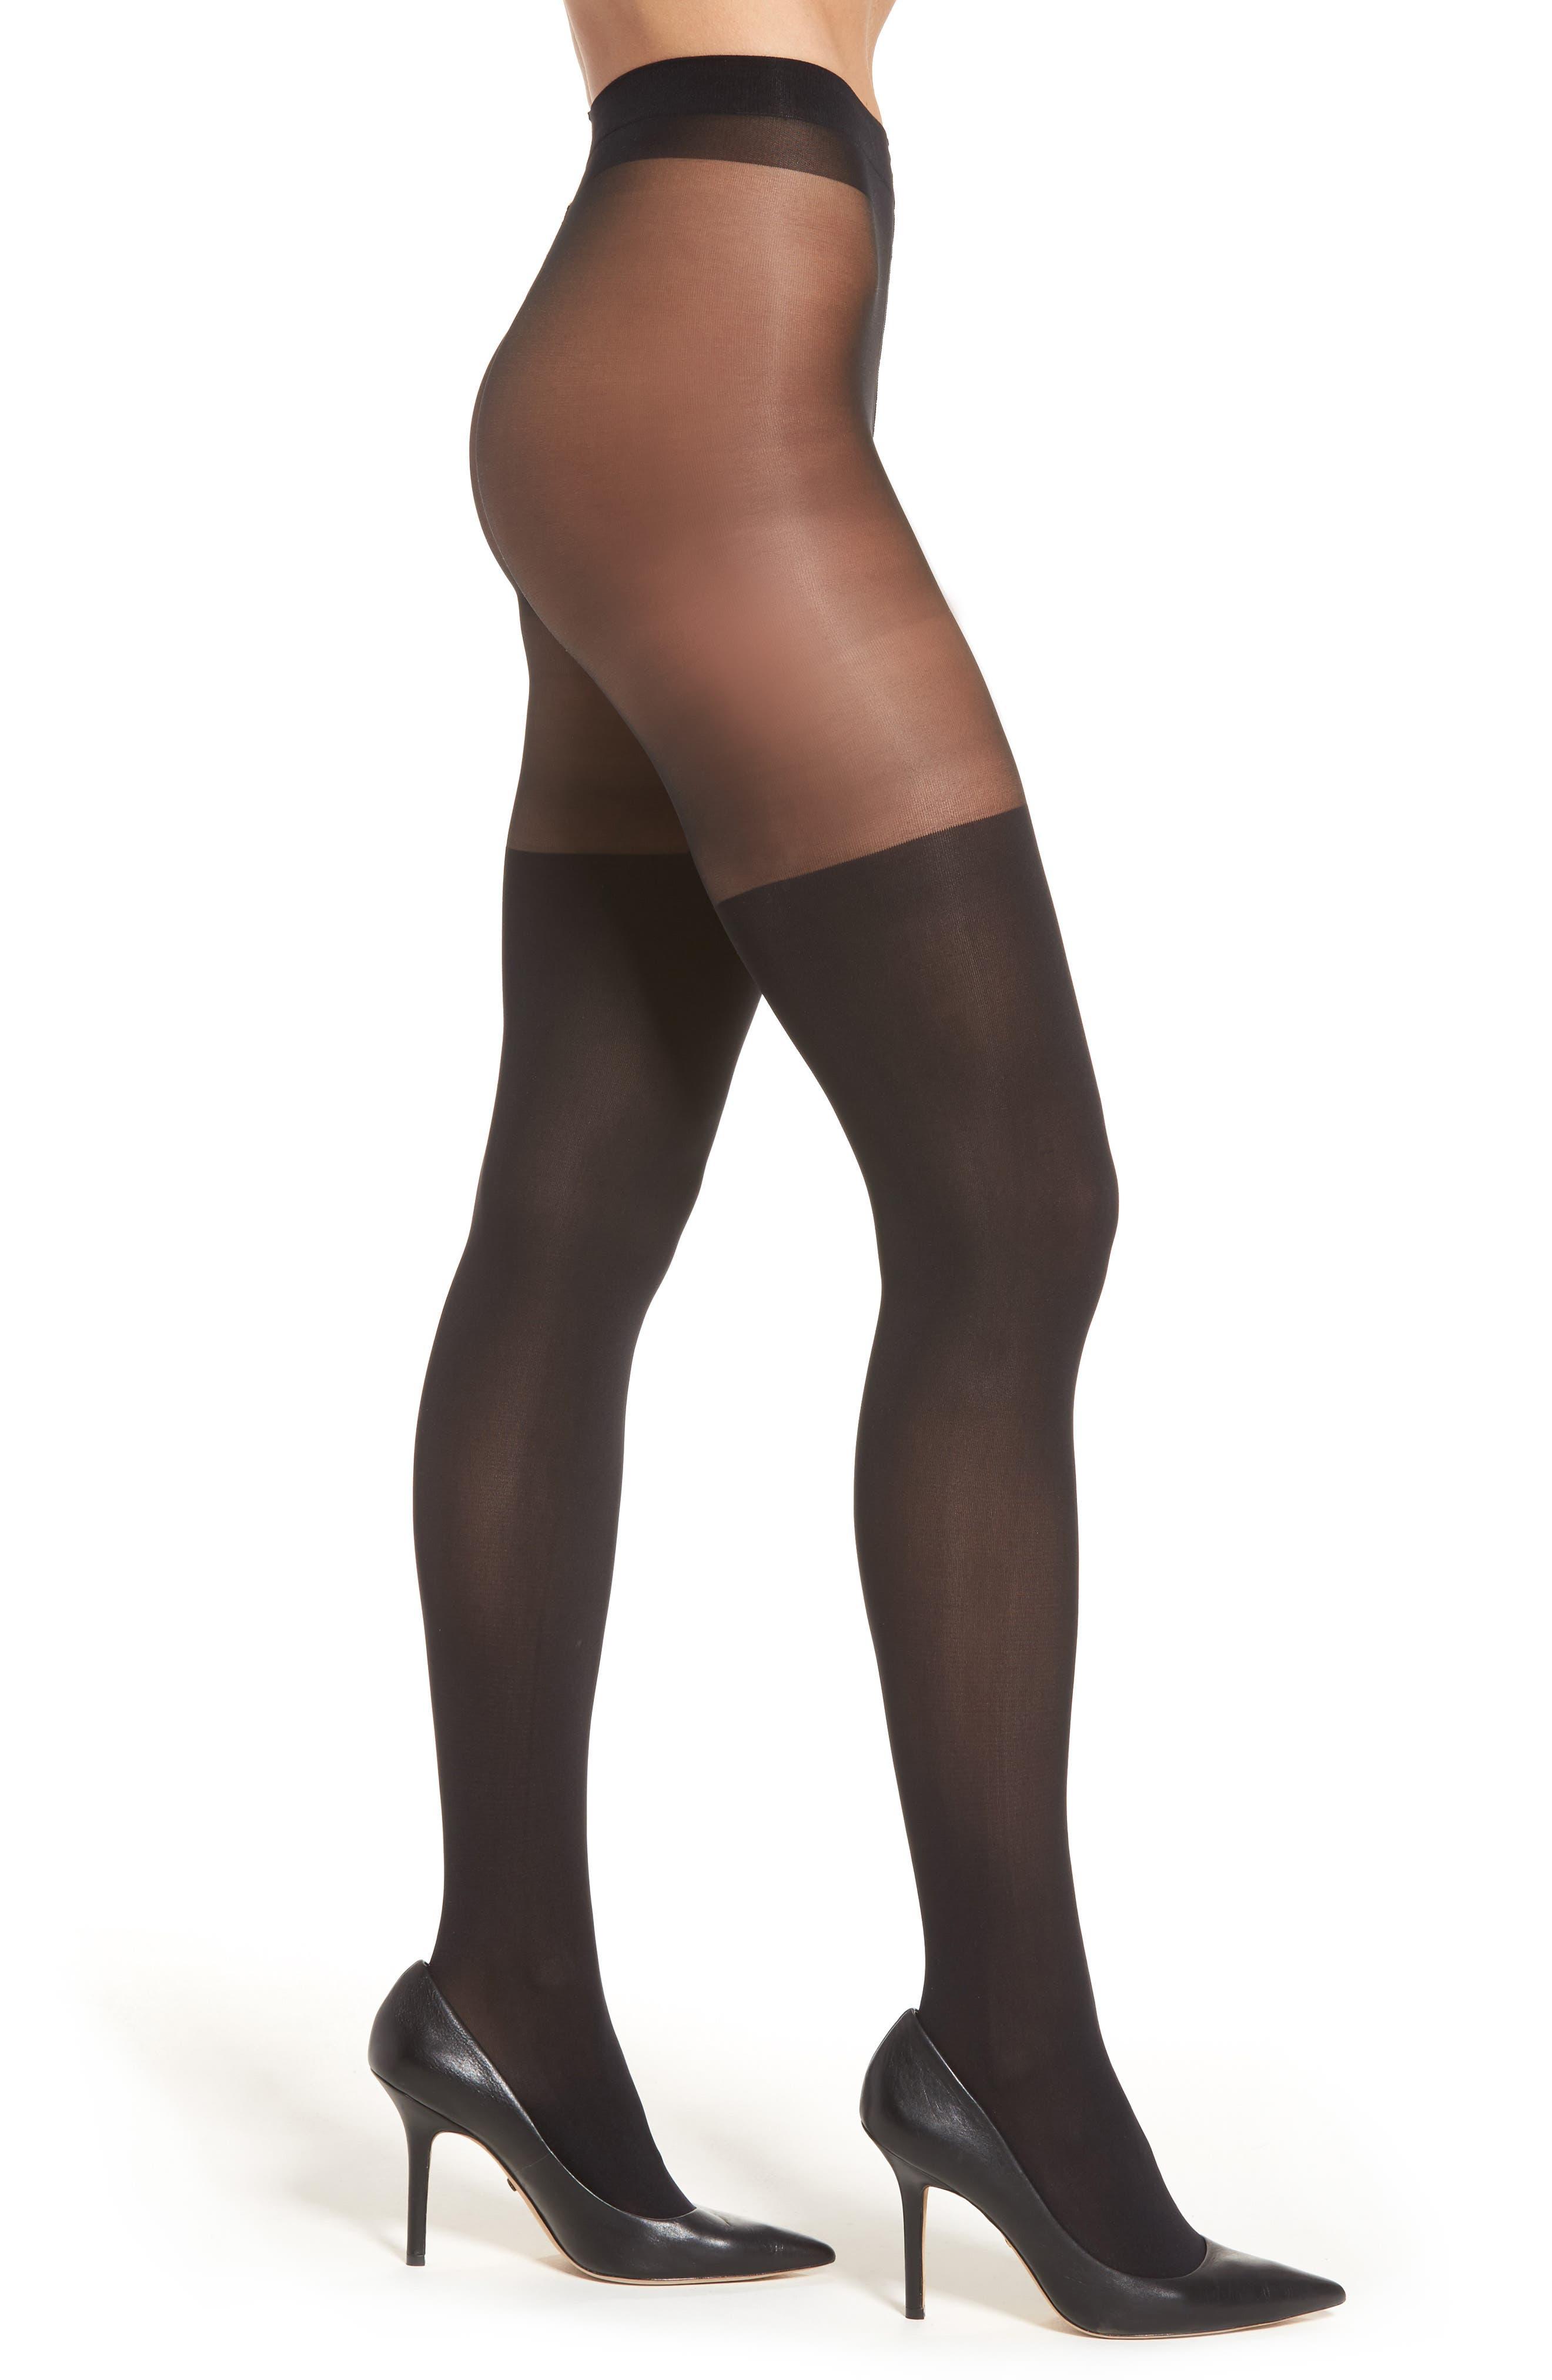 Illusion Thigh High Pantyhose,                         Main,                         color, Black